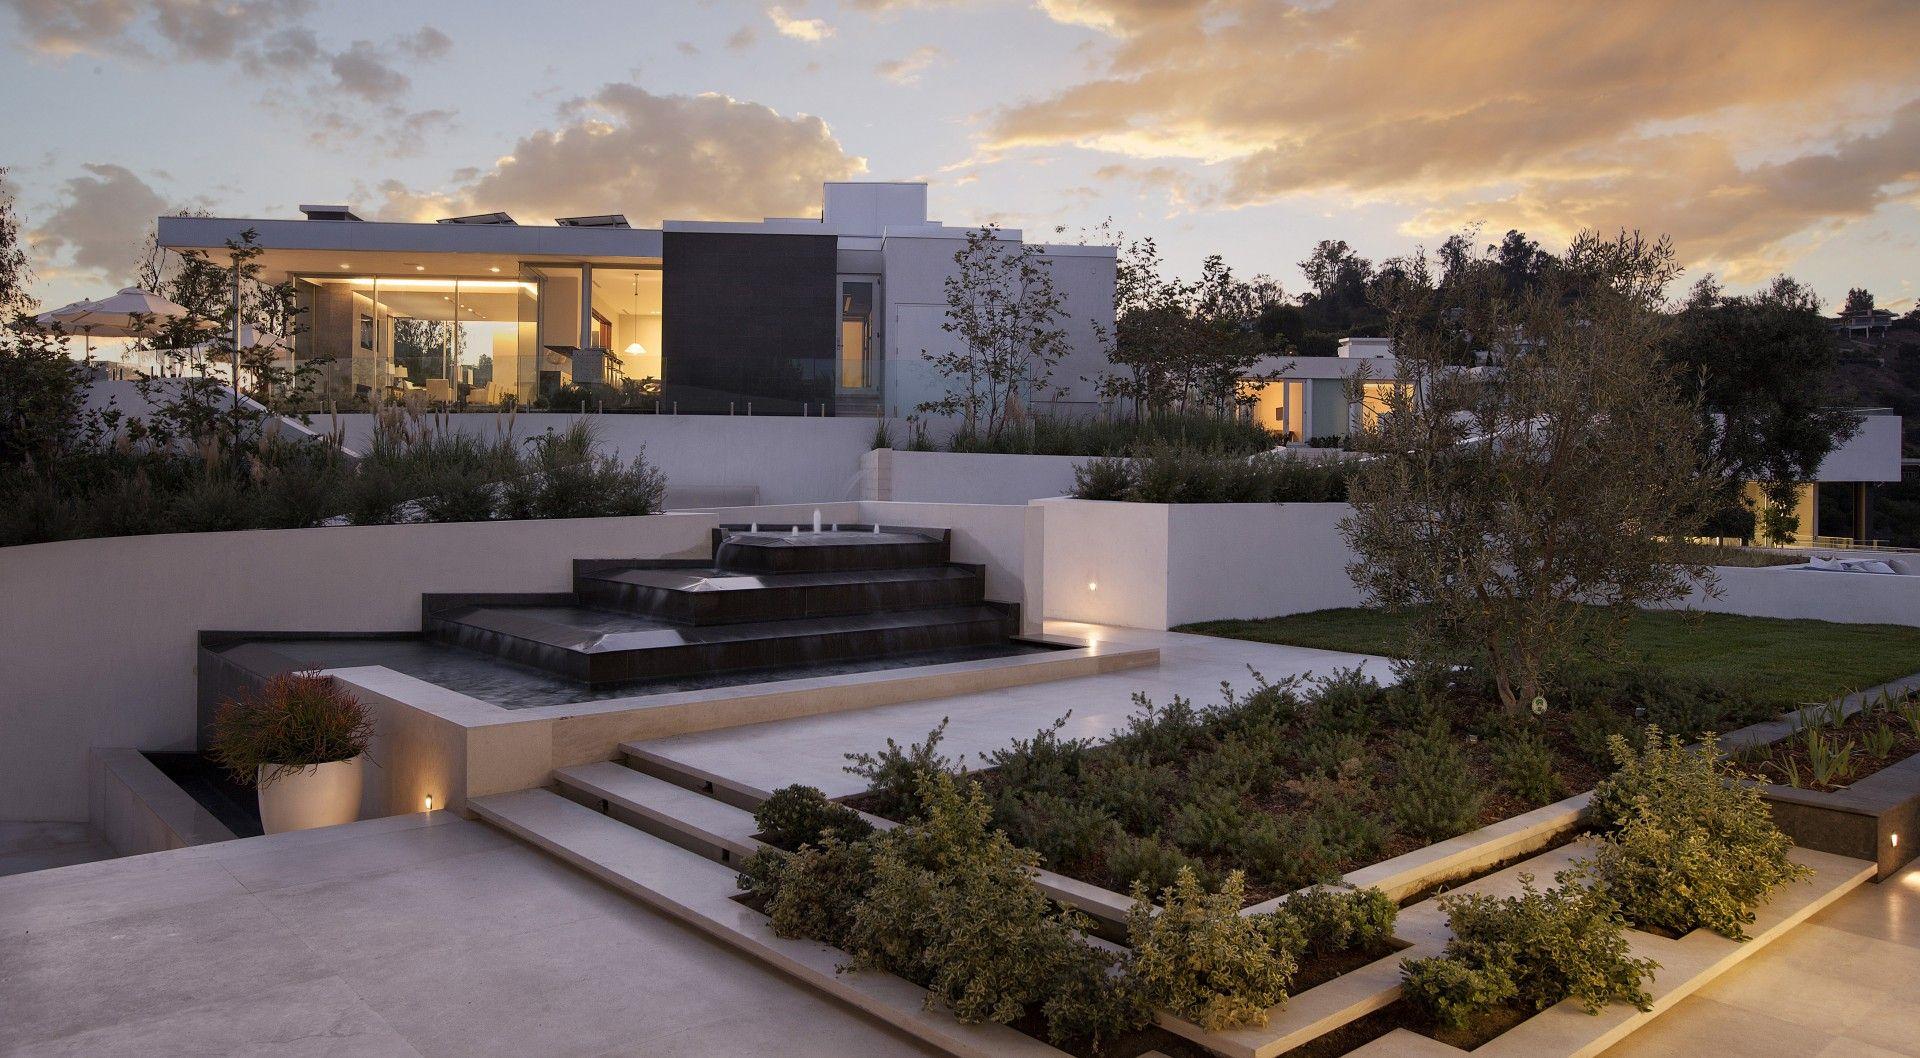 Los angeles laguna beach architecture contemporary projects mcclean design